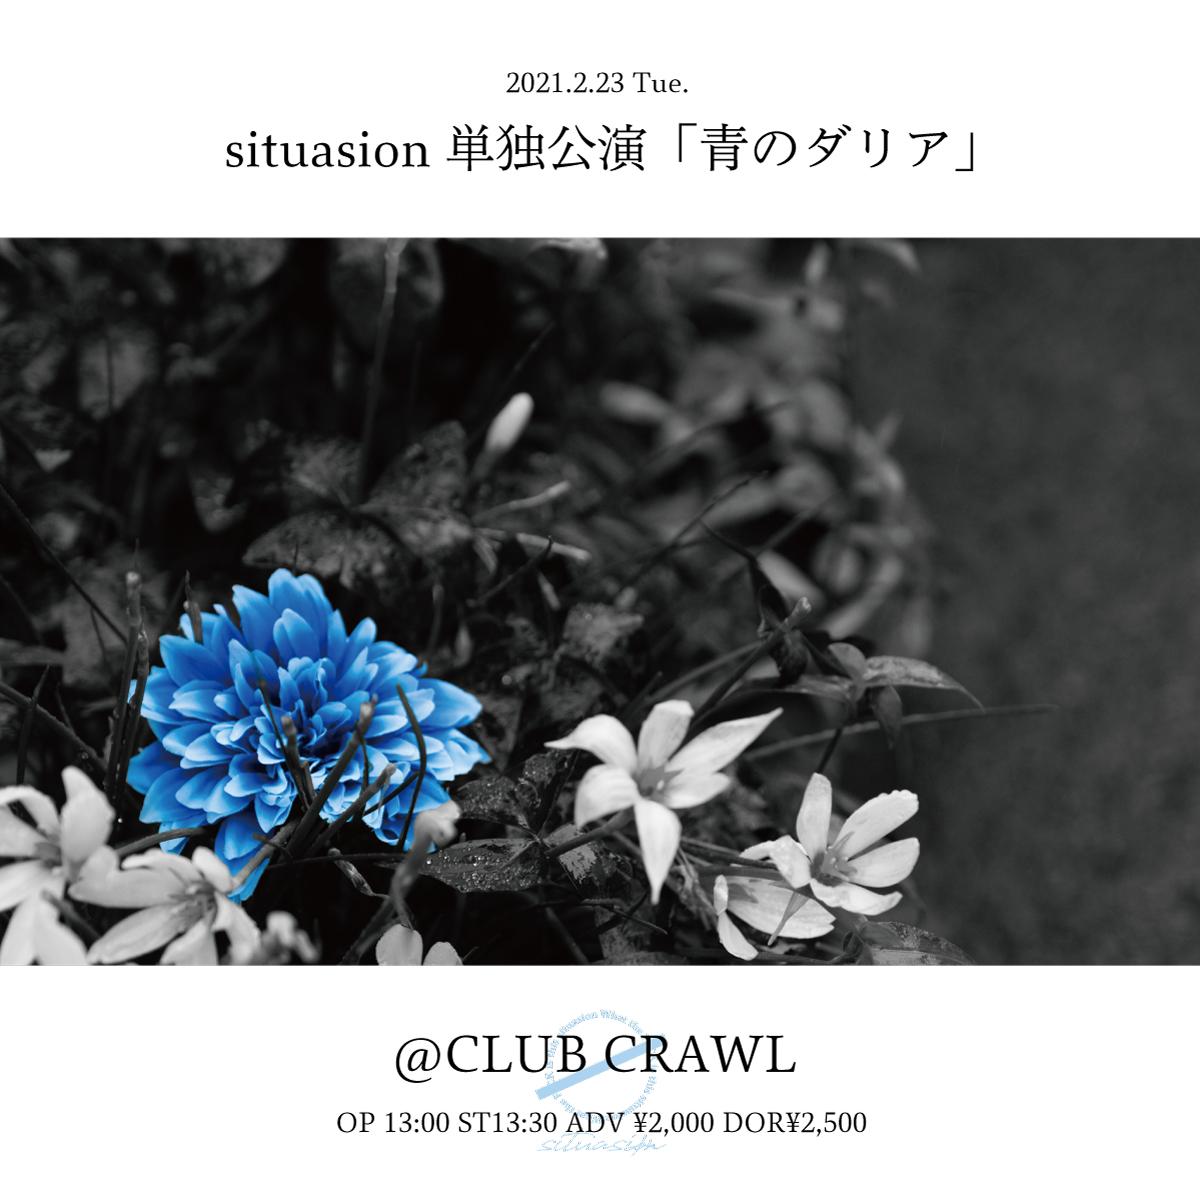 situasion単独公演「青のダリア」